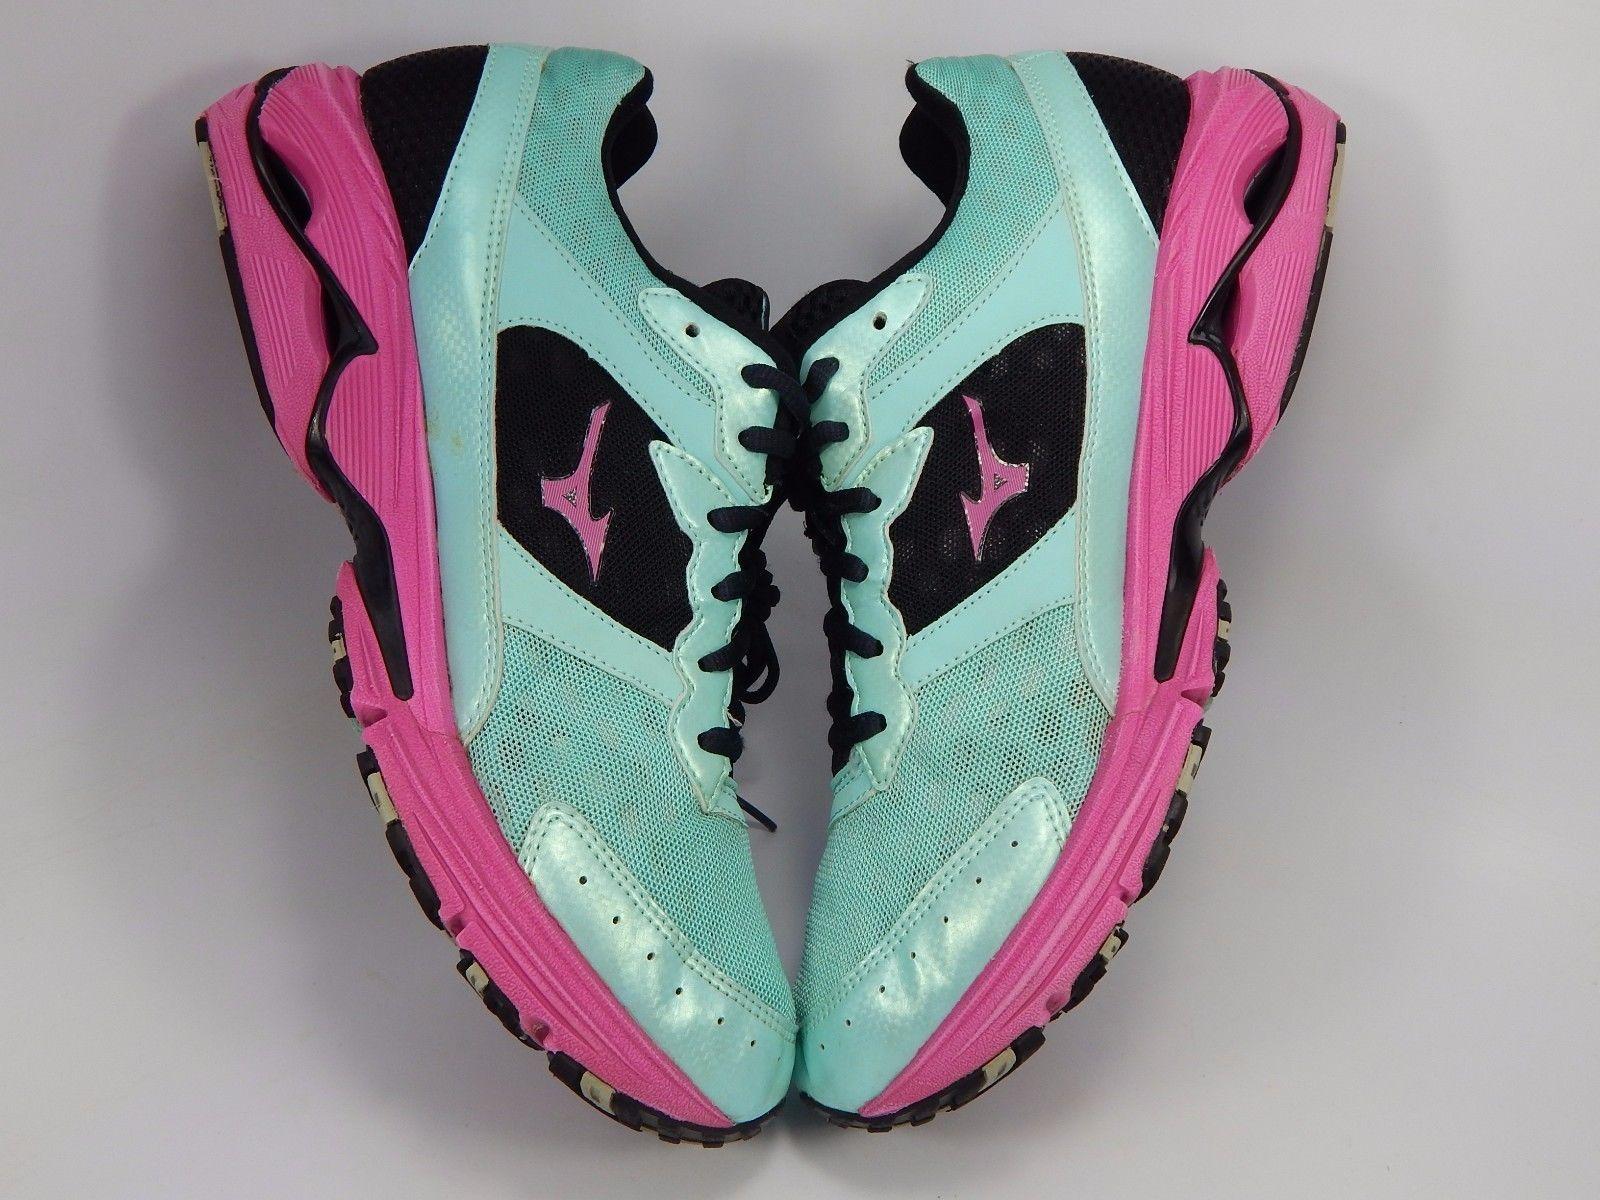 Mizuno Wave Rider 16 Women's Running Shoes Size US 10 M (B) EU 41 Green Pink